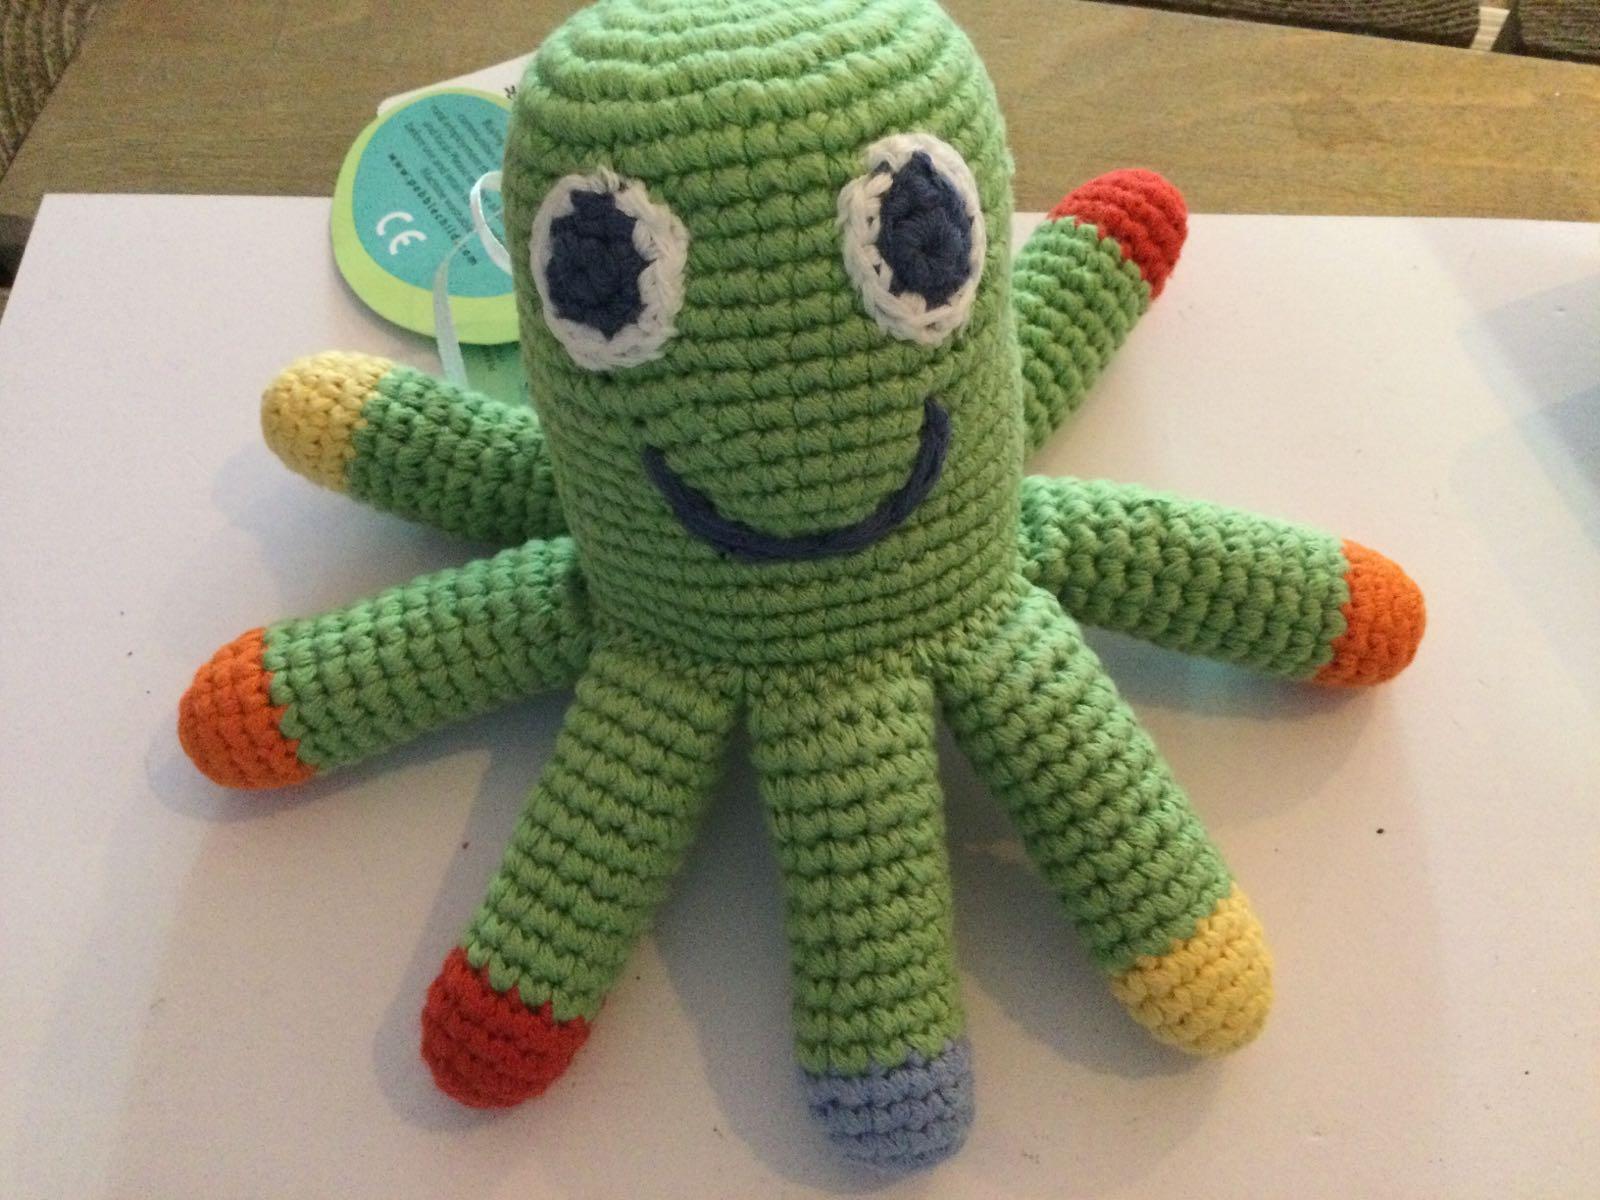 Pebble - Crochet Octopus Rattle - Apple green